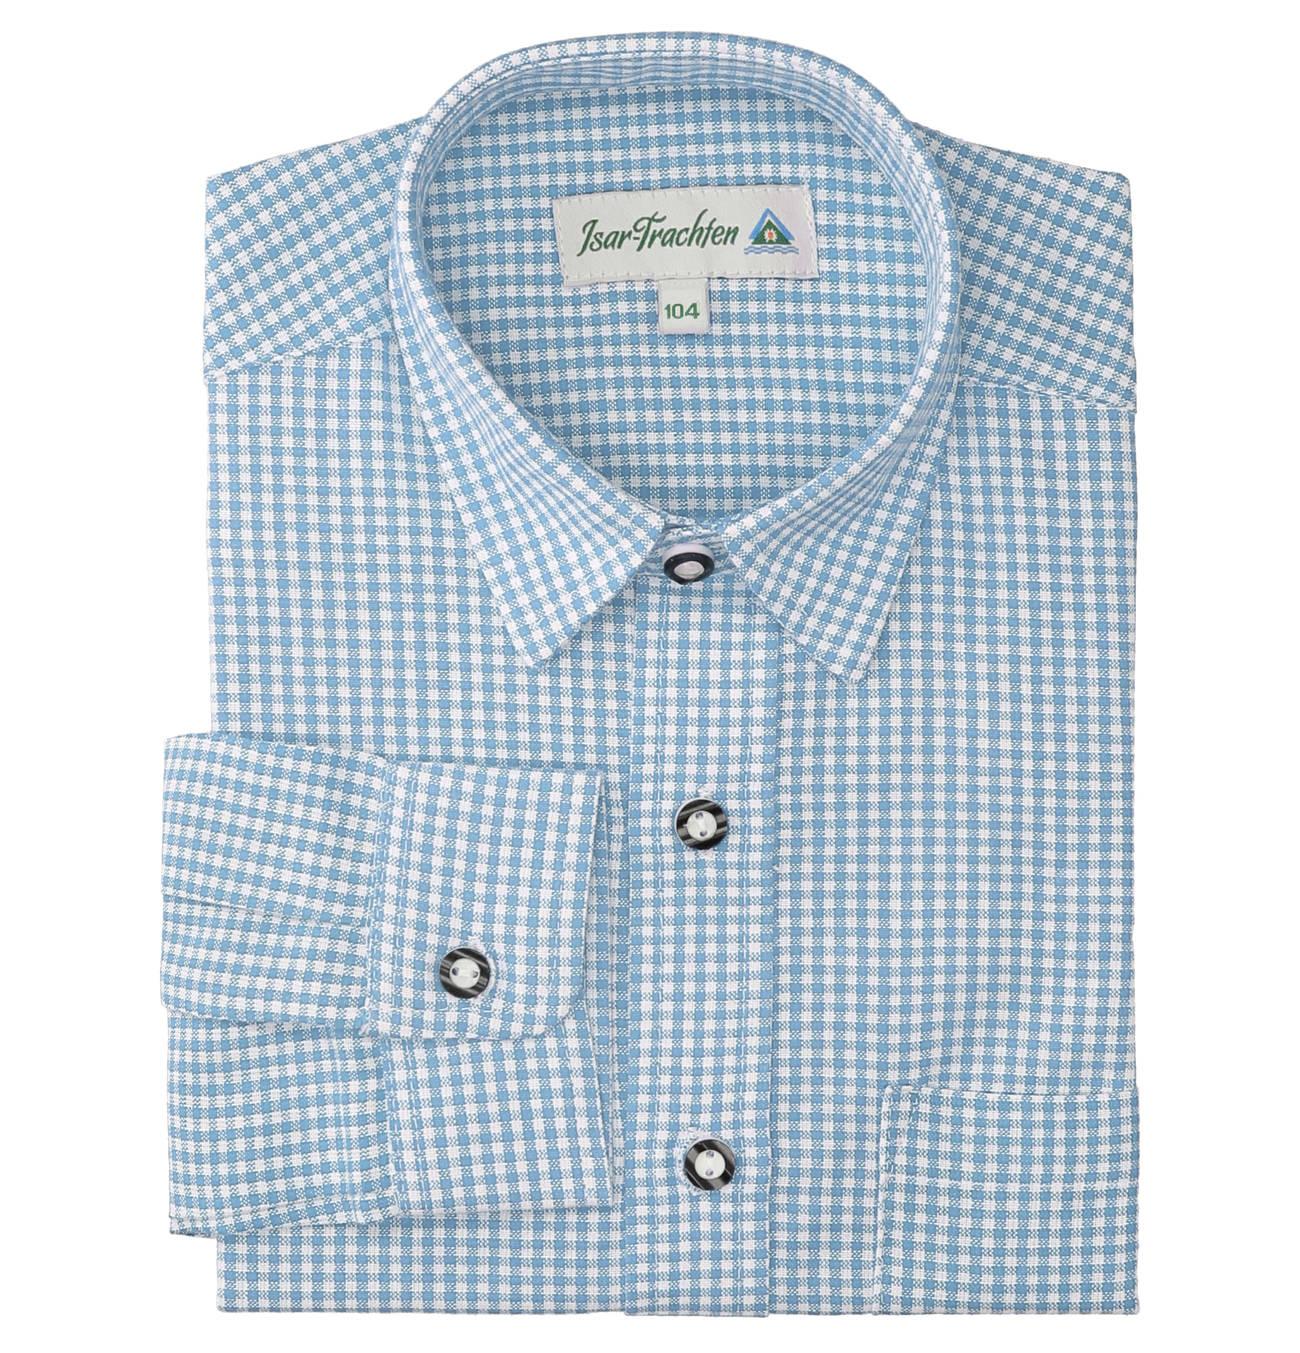 Hemd Baumwolle wei/ß Jungen Langarm Trachtenhemd Isar-Trachten Kinderhemd